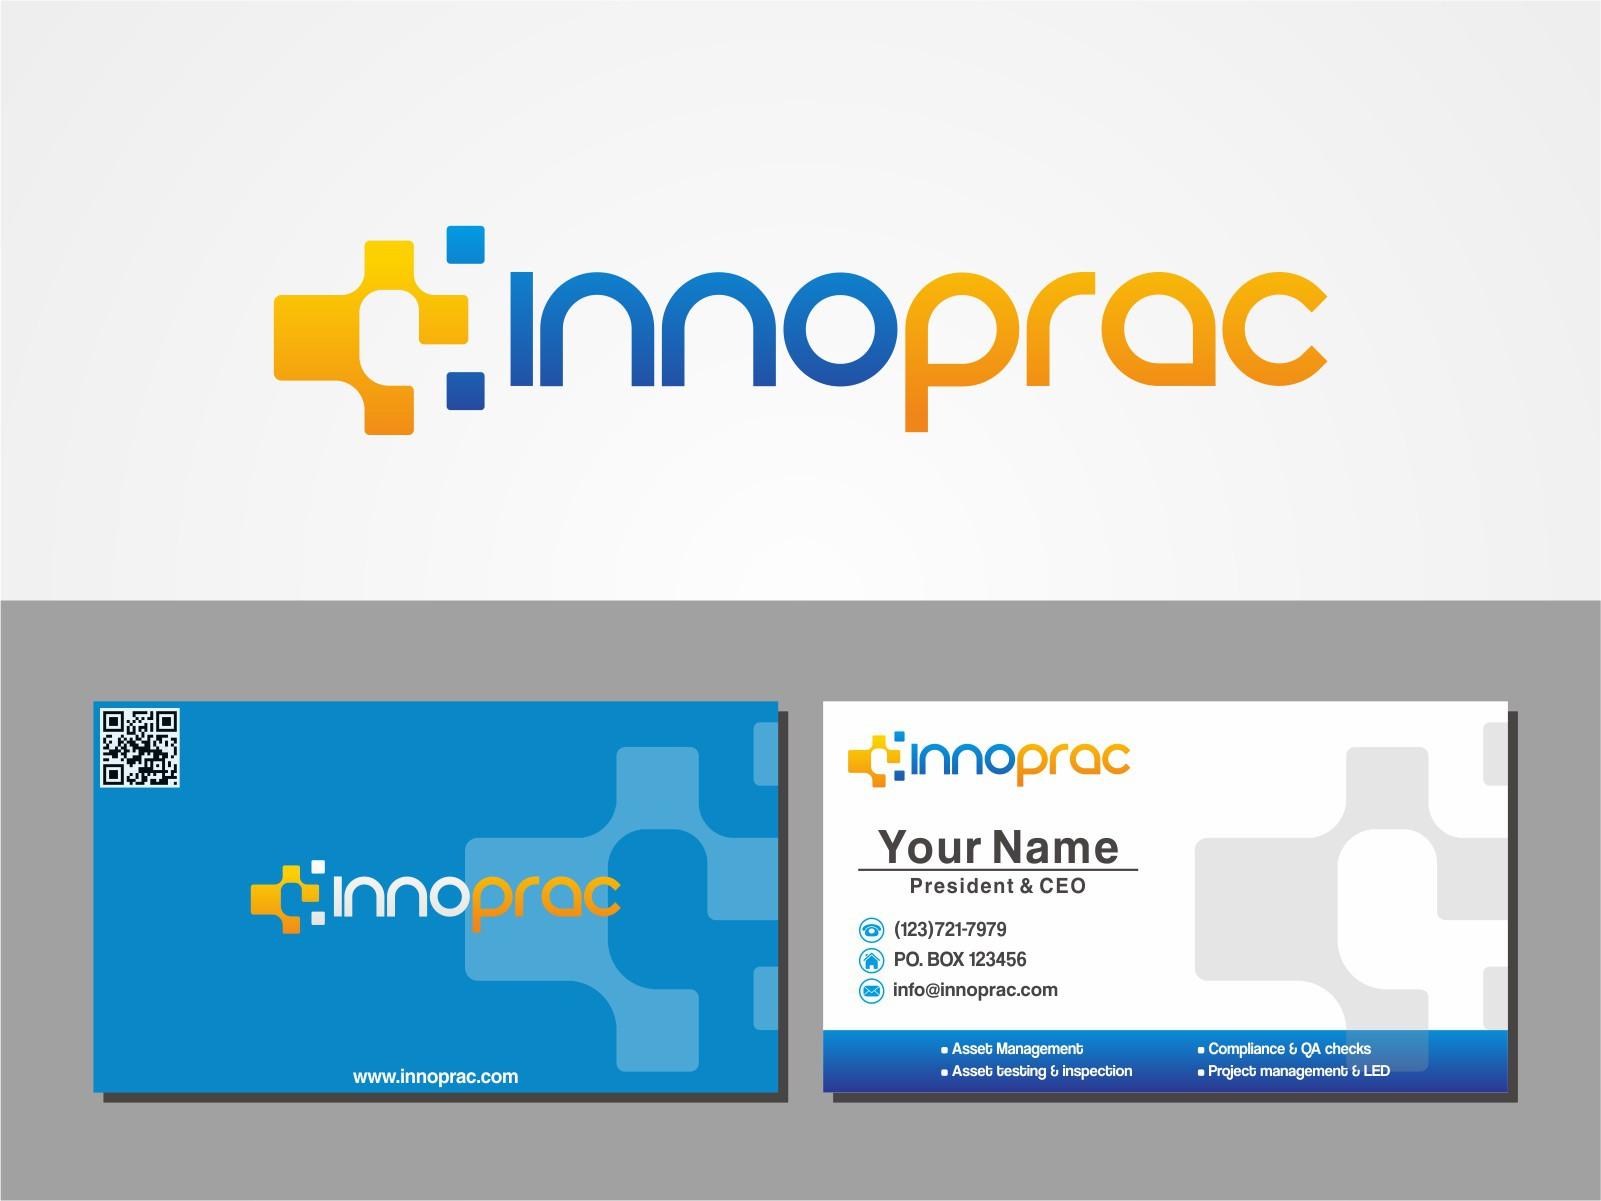 Hi cool designers. Help me put Fresh, Innovative, Practical & Tech into a Logo/business card.